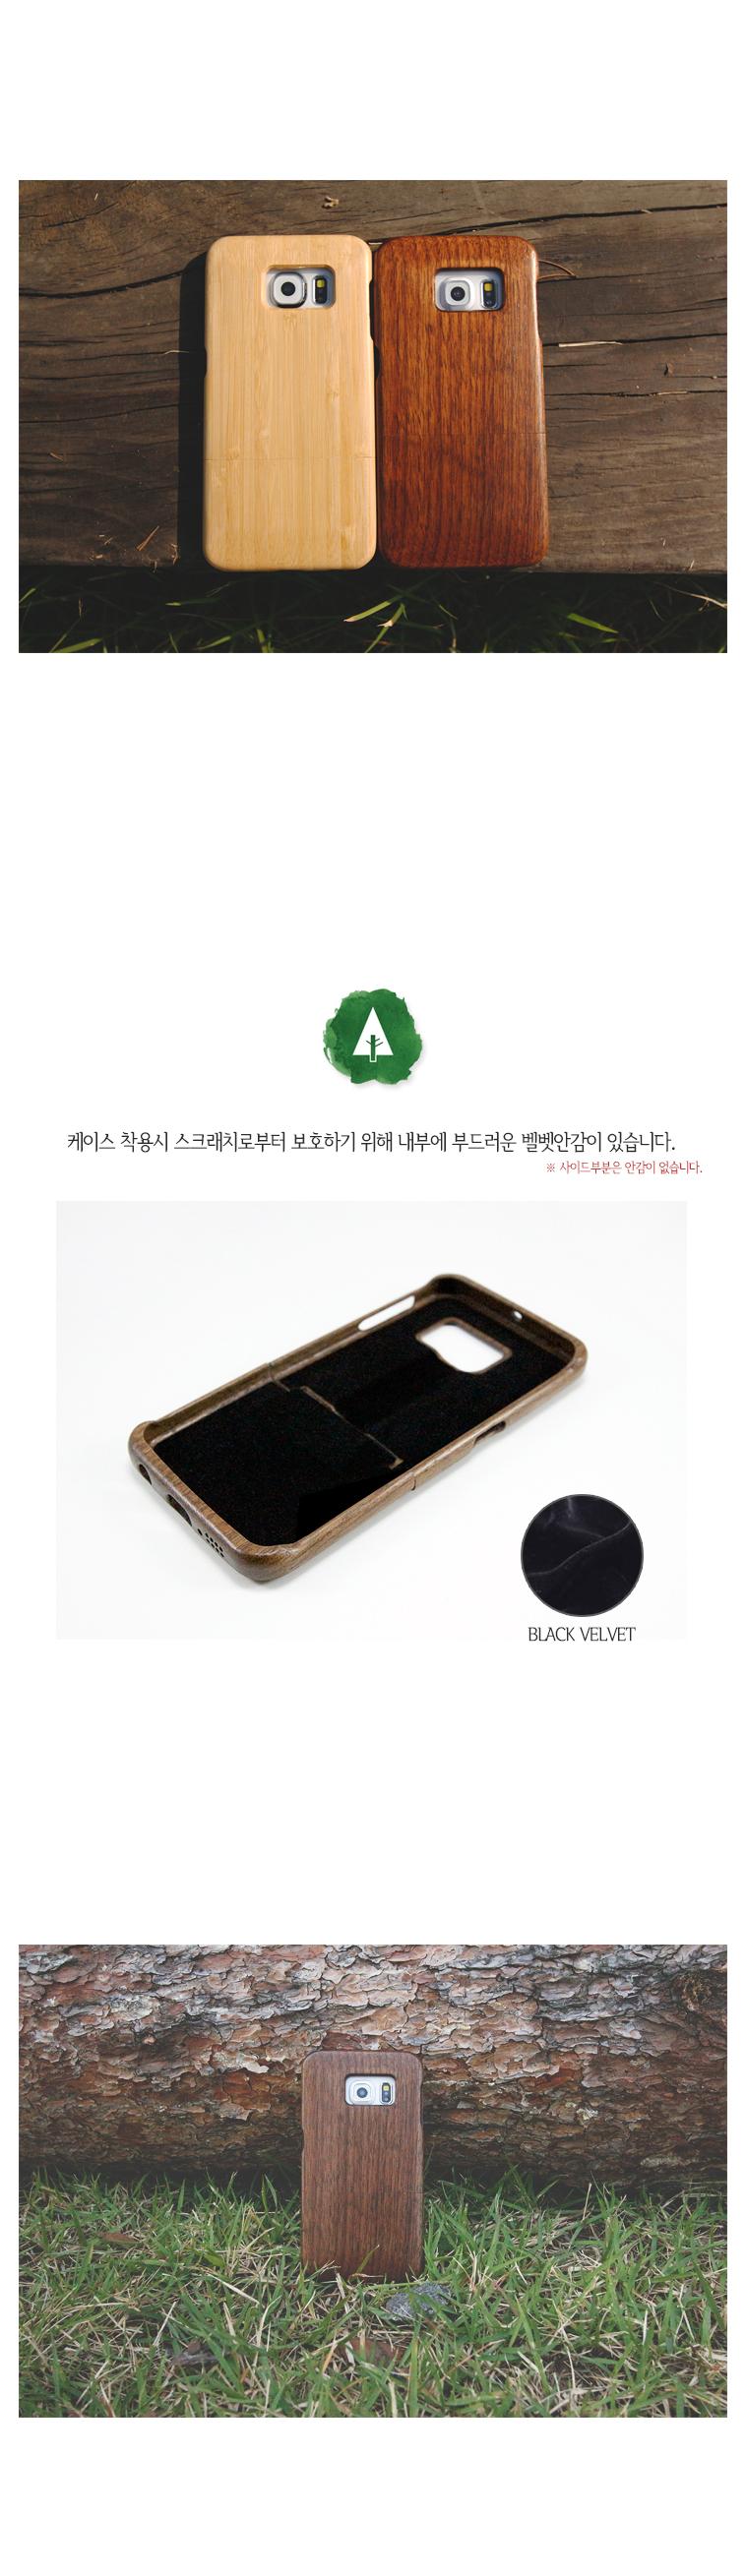 [ BISKET ] GalaxyS7 edge Ecolife Wood Case